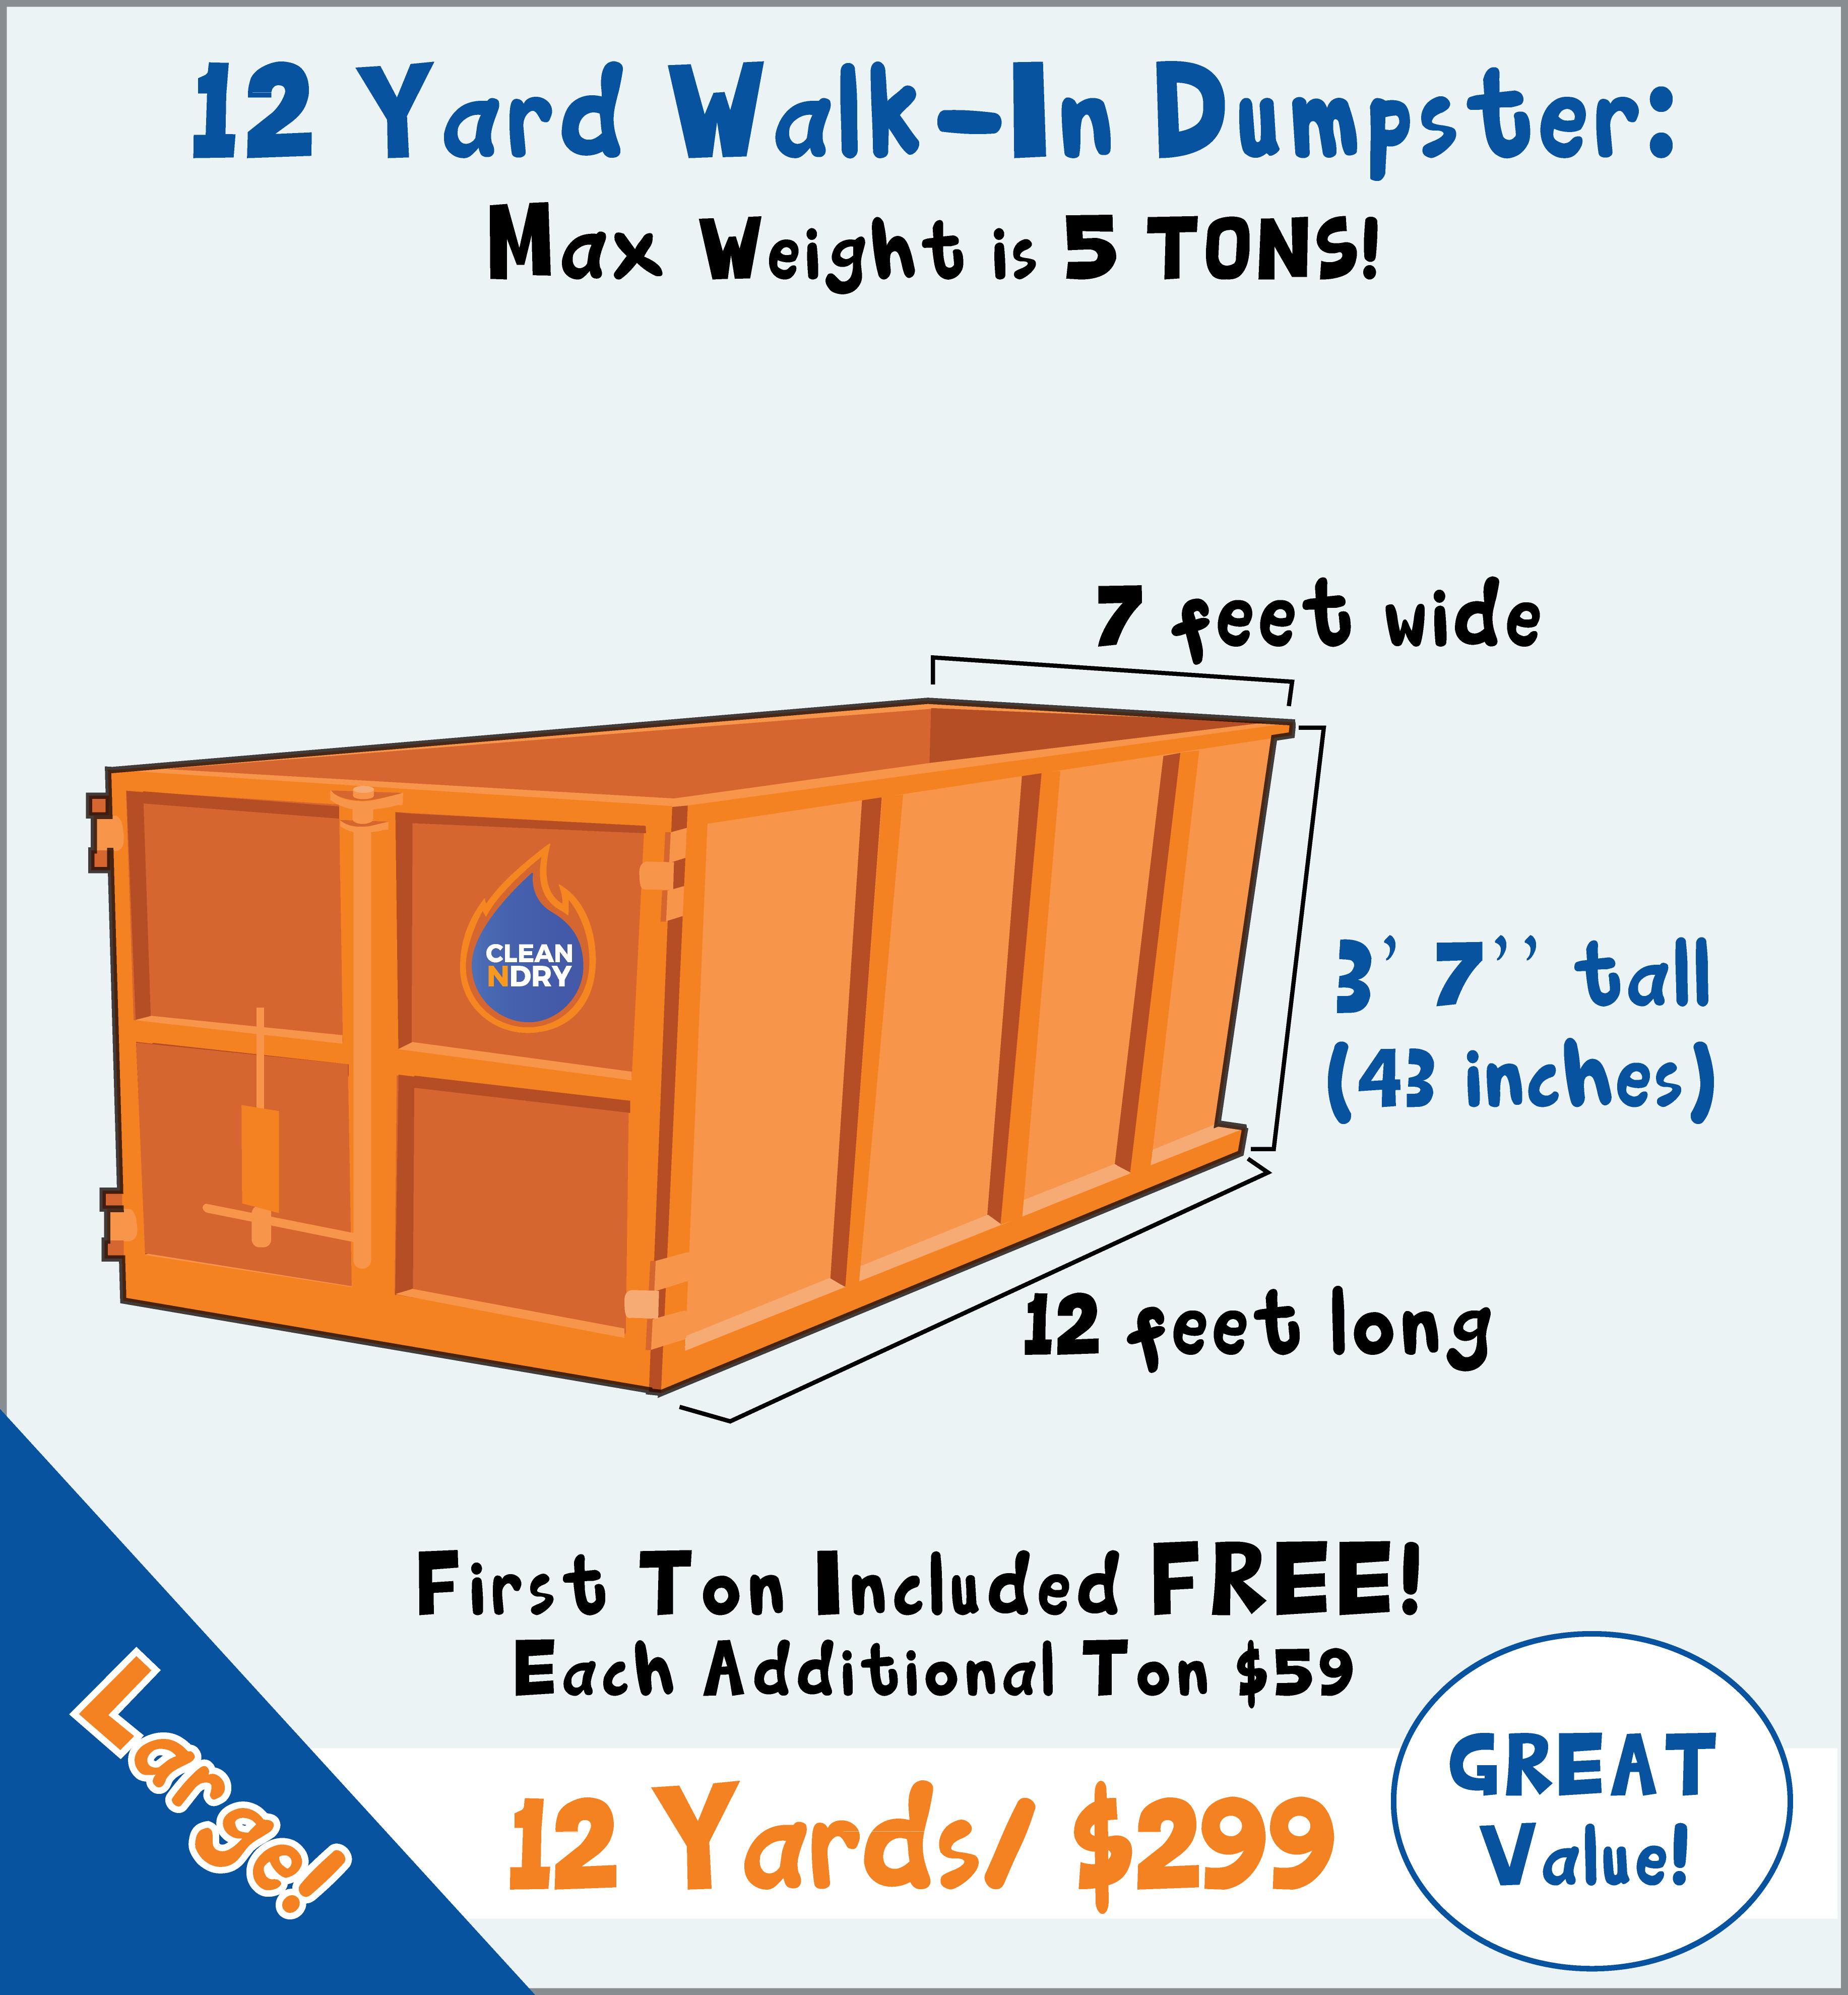 Rent a dumpster delivery orlando trash bin rental walk in dumpster rental orlando 12 yard